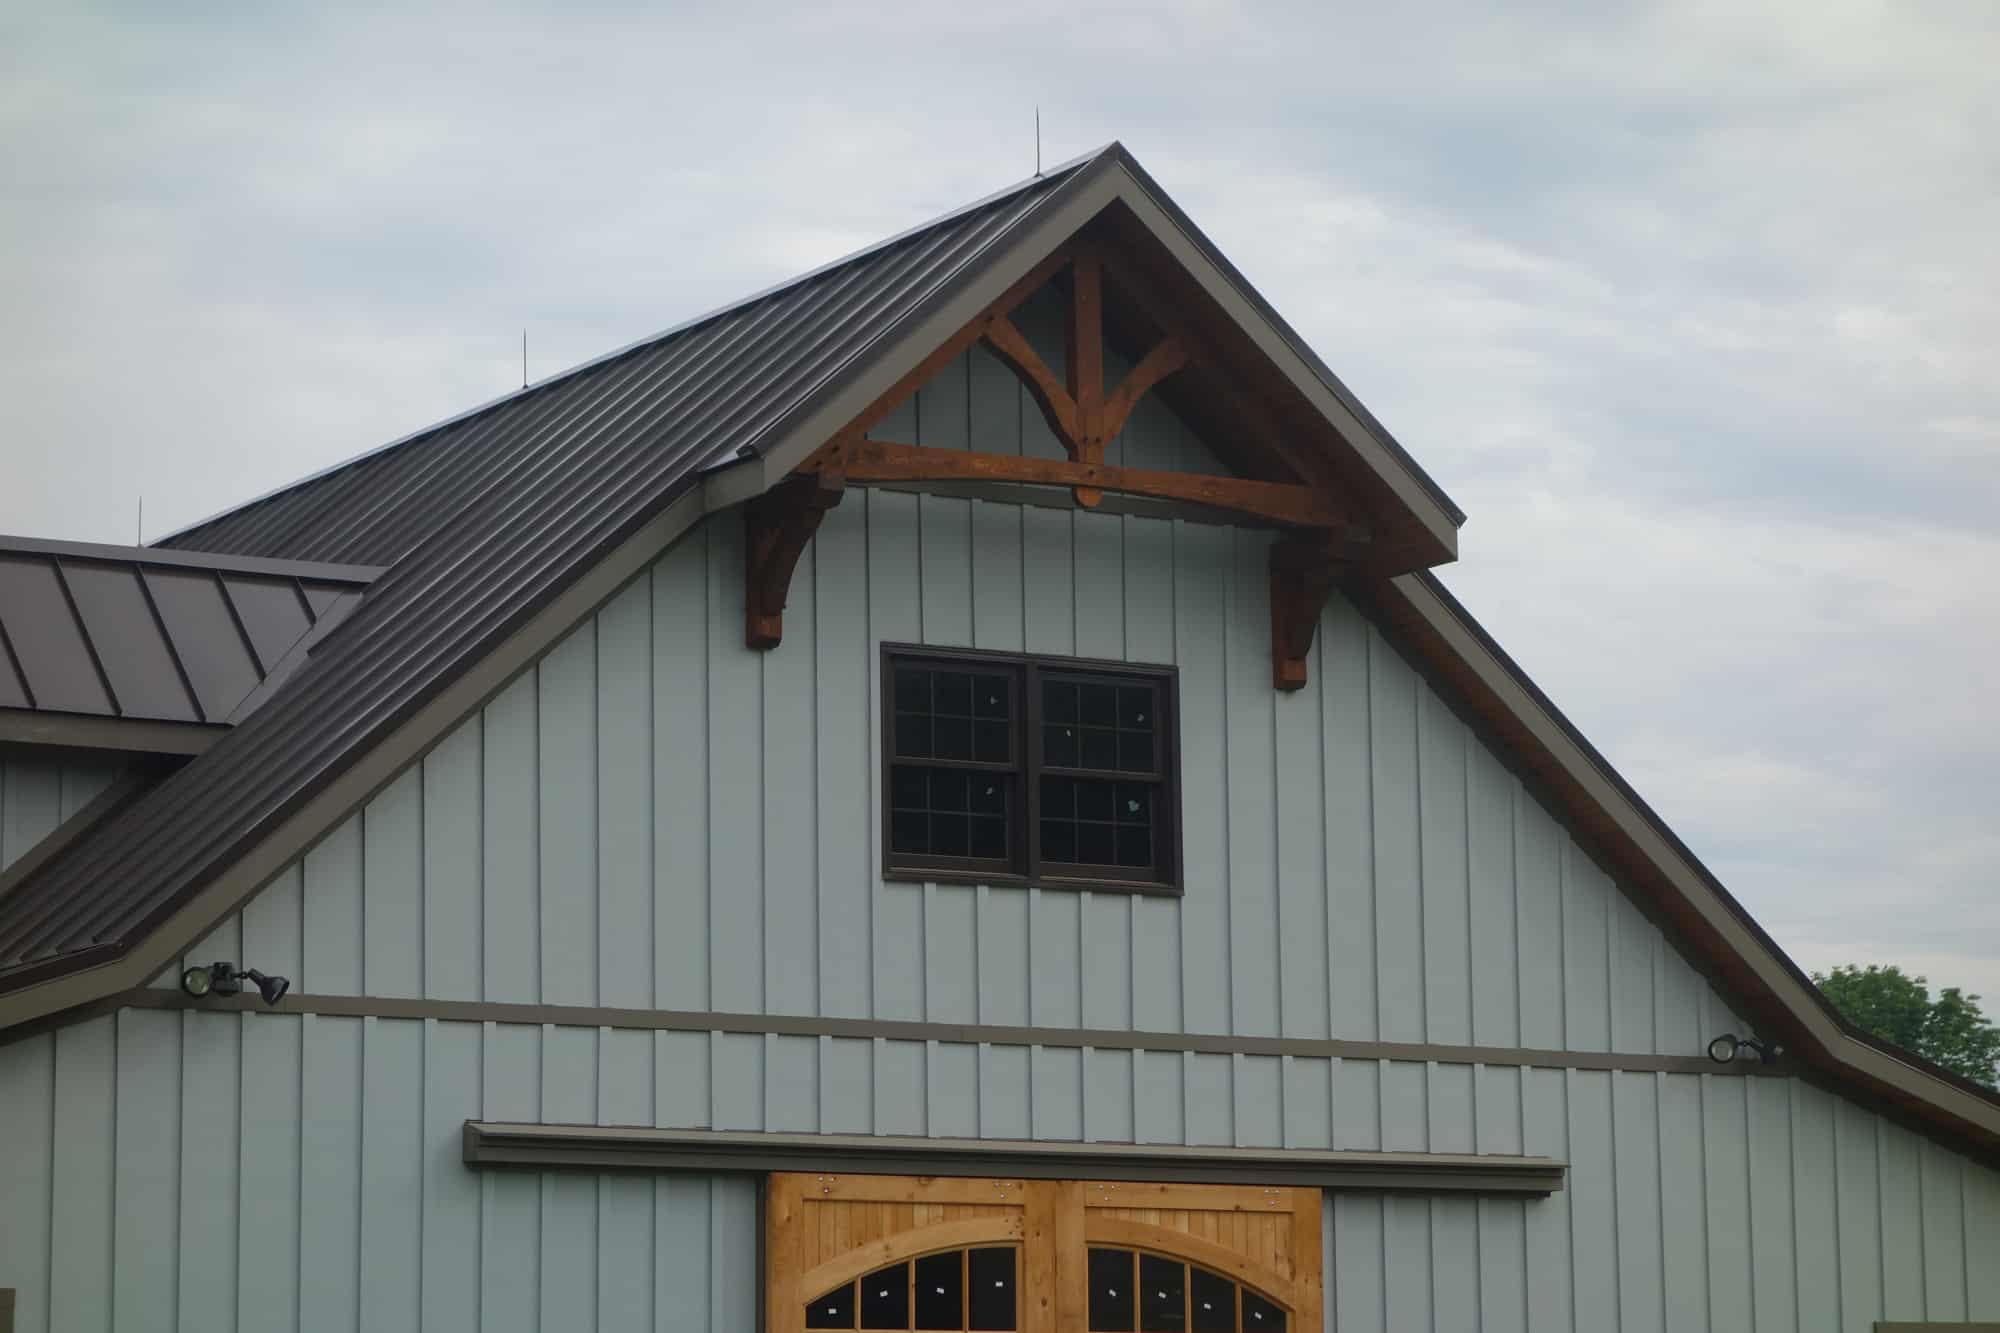 mass timber metal roof horse stalls